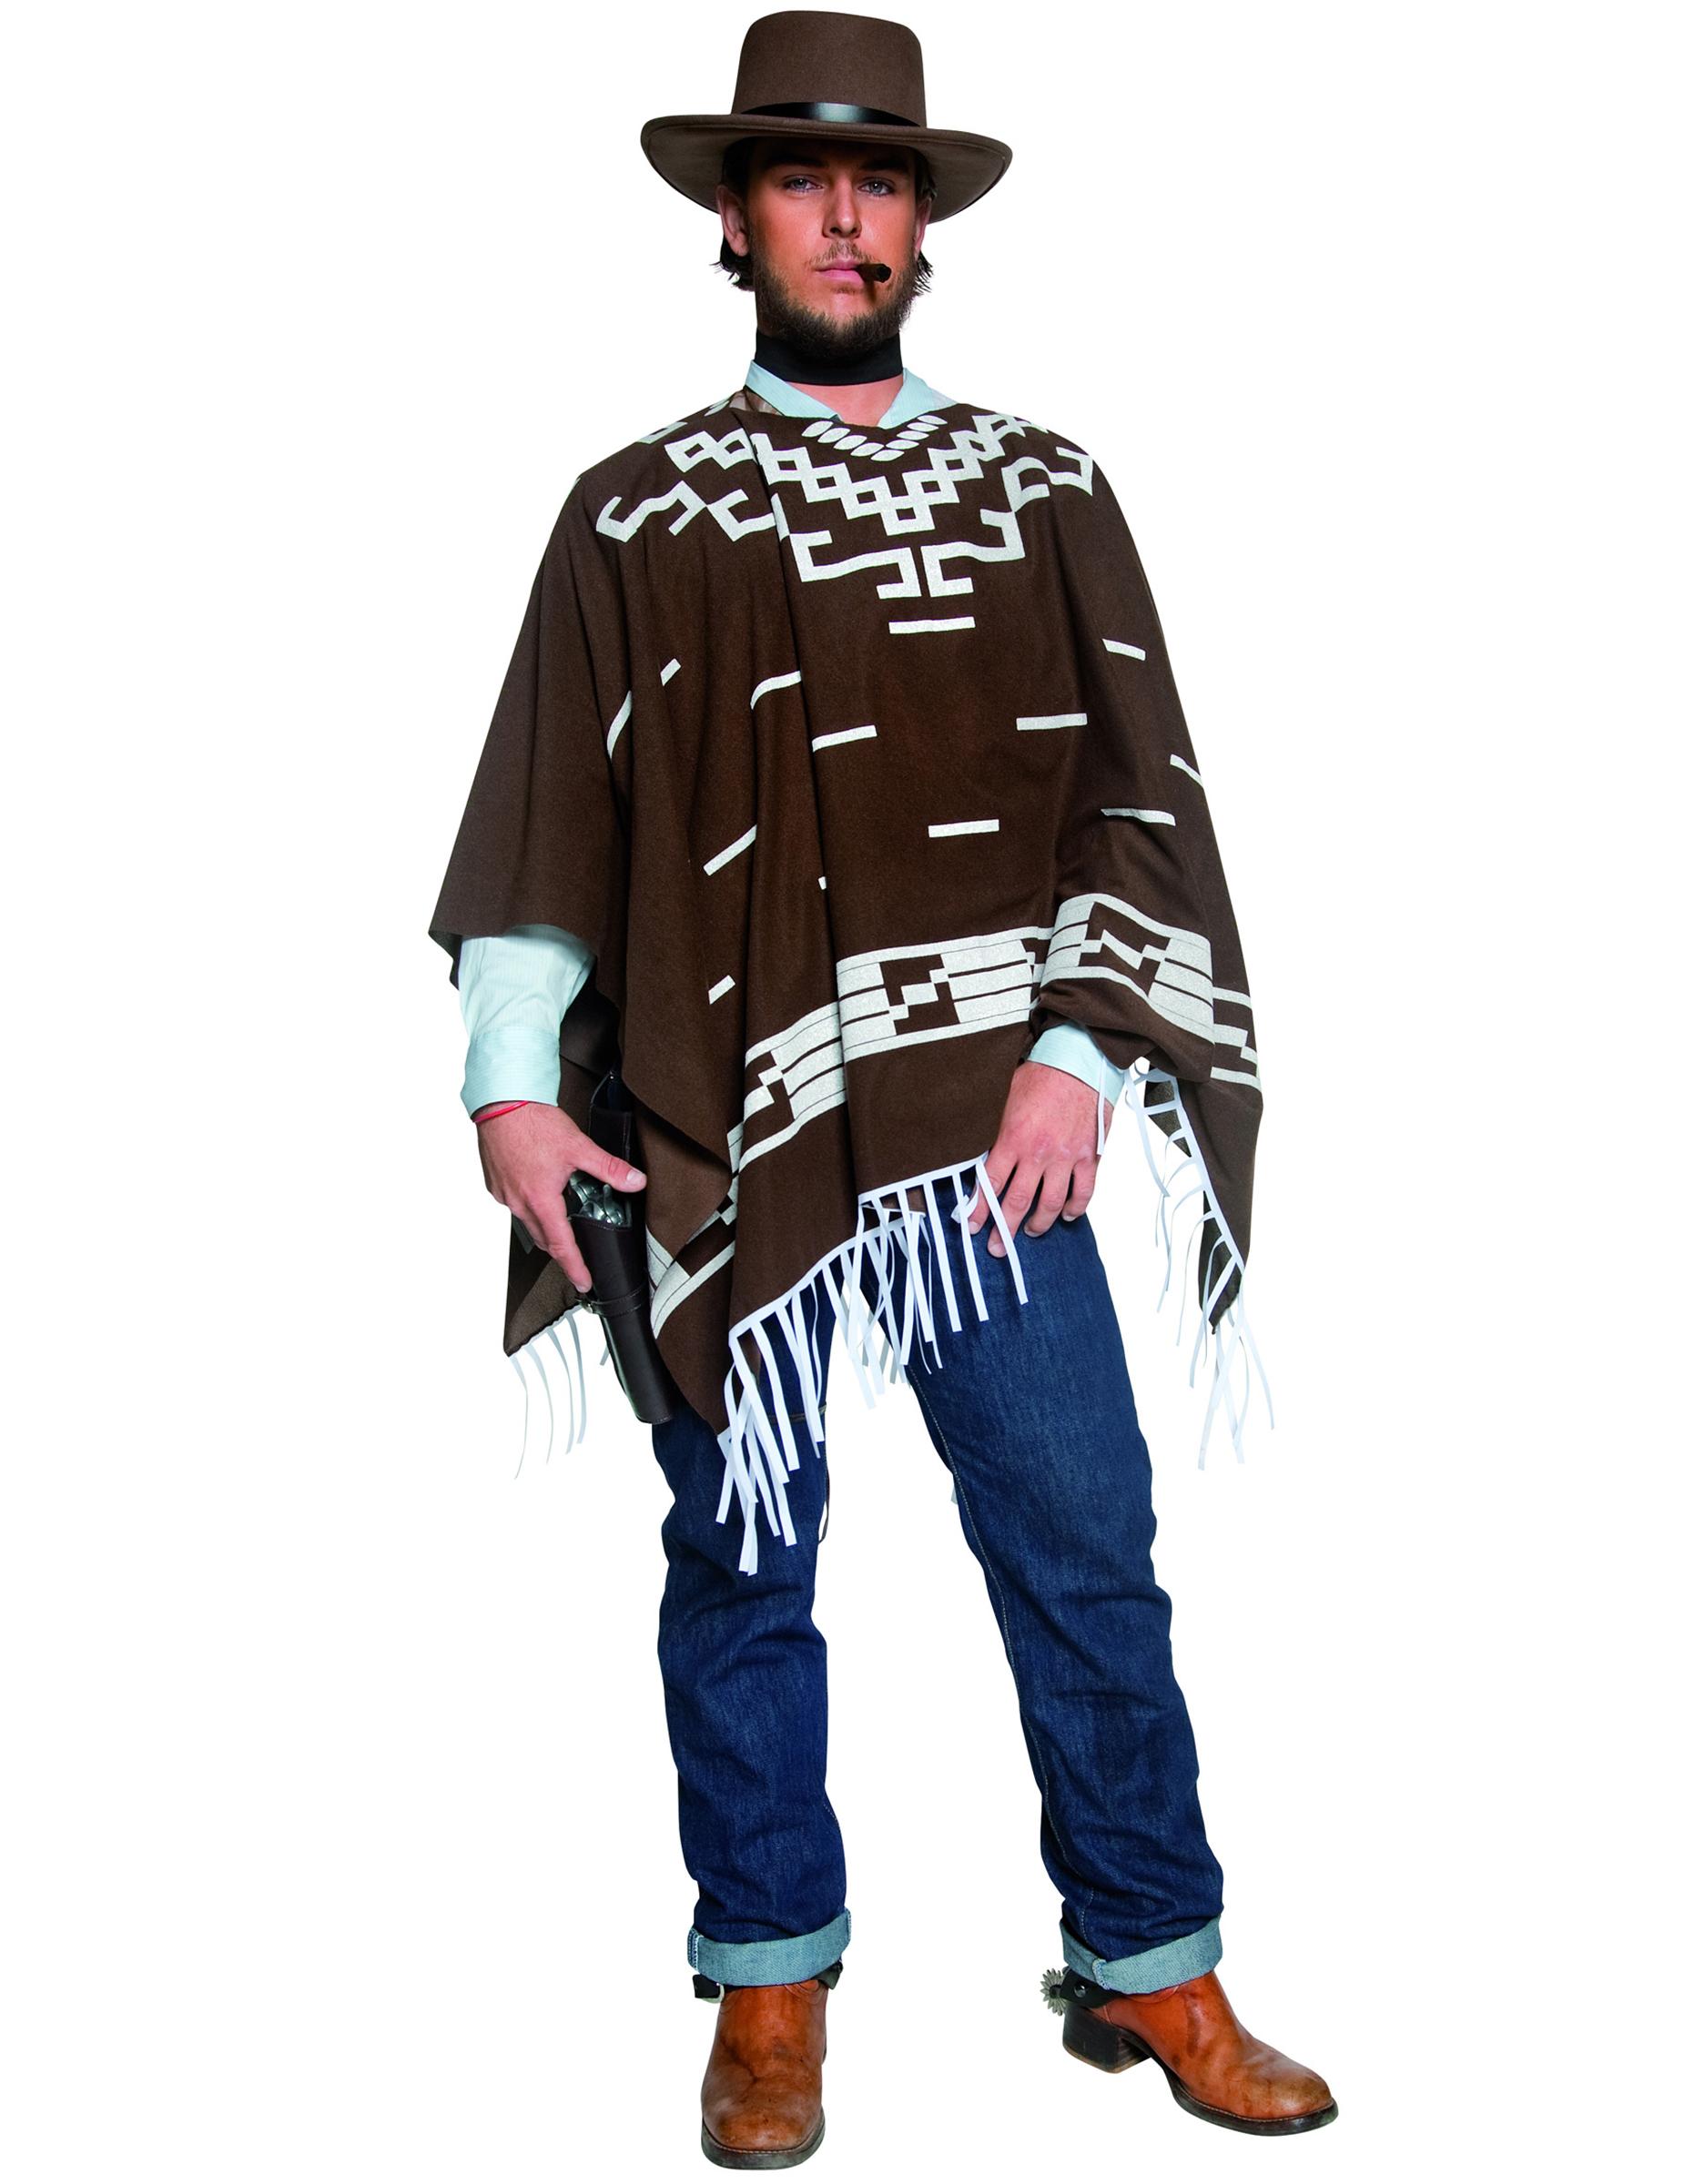 72817a343efb6d Cowboy Kostüm Poncho braun-weiss , günstige Faschings Accessoires ...